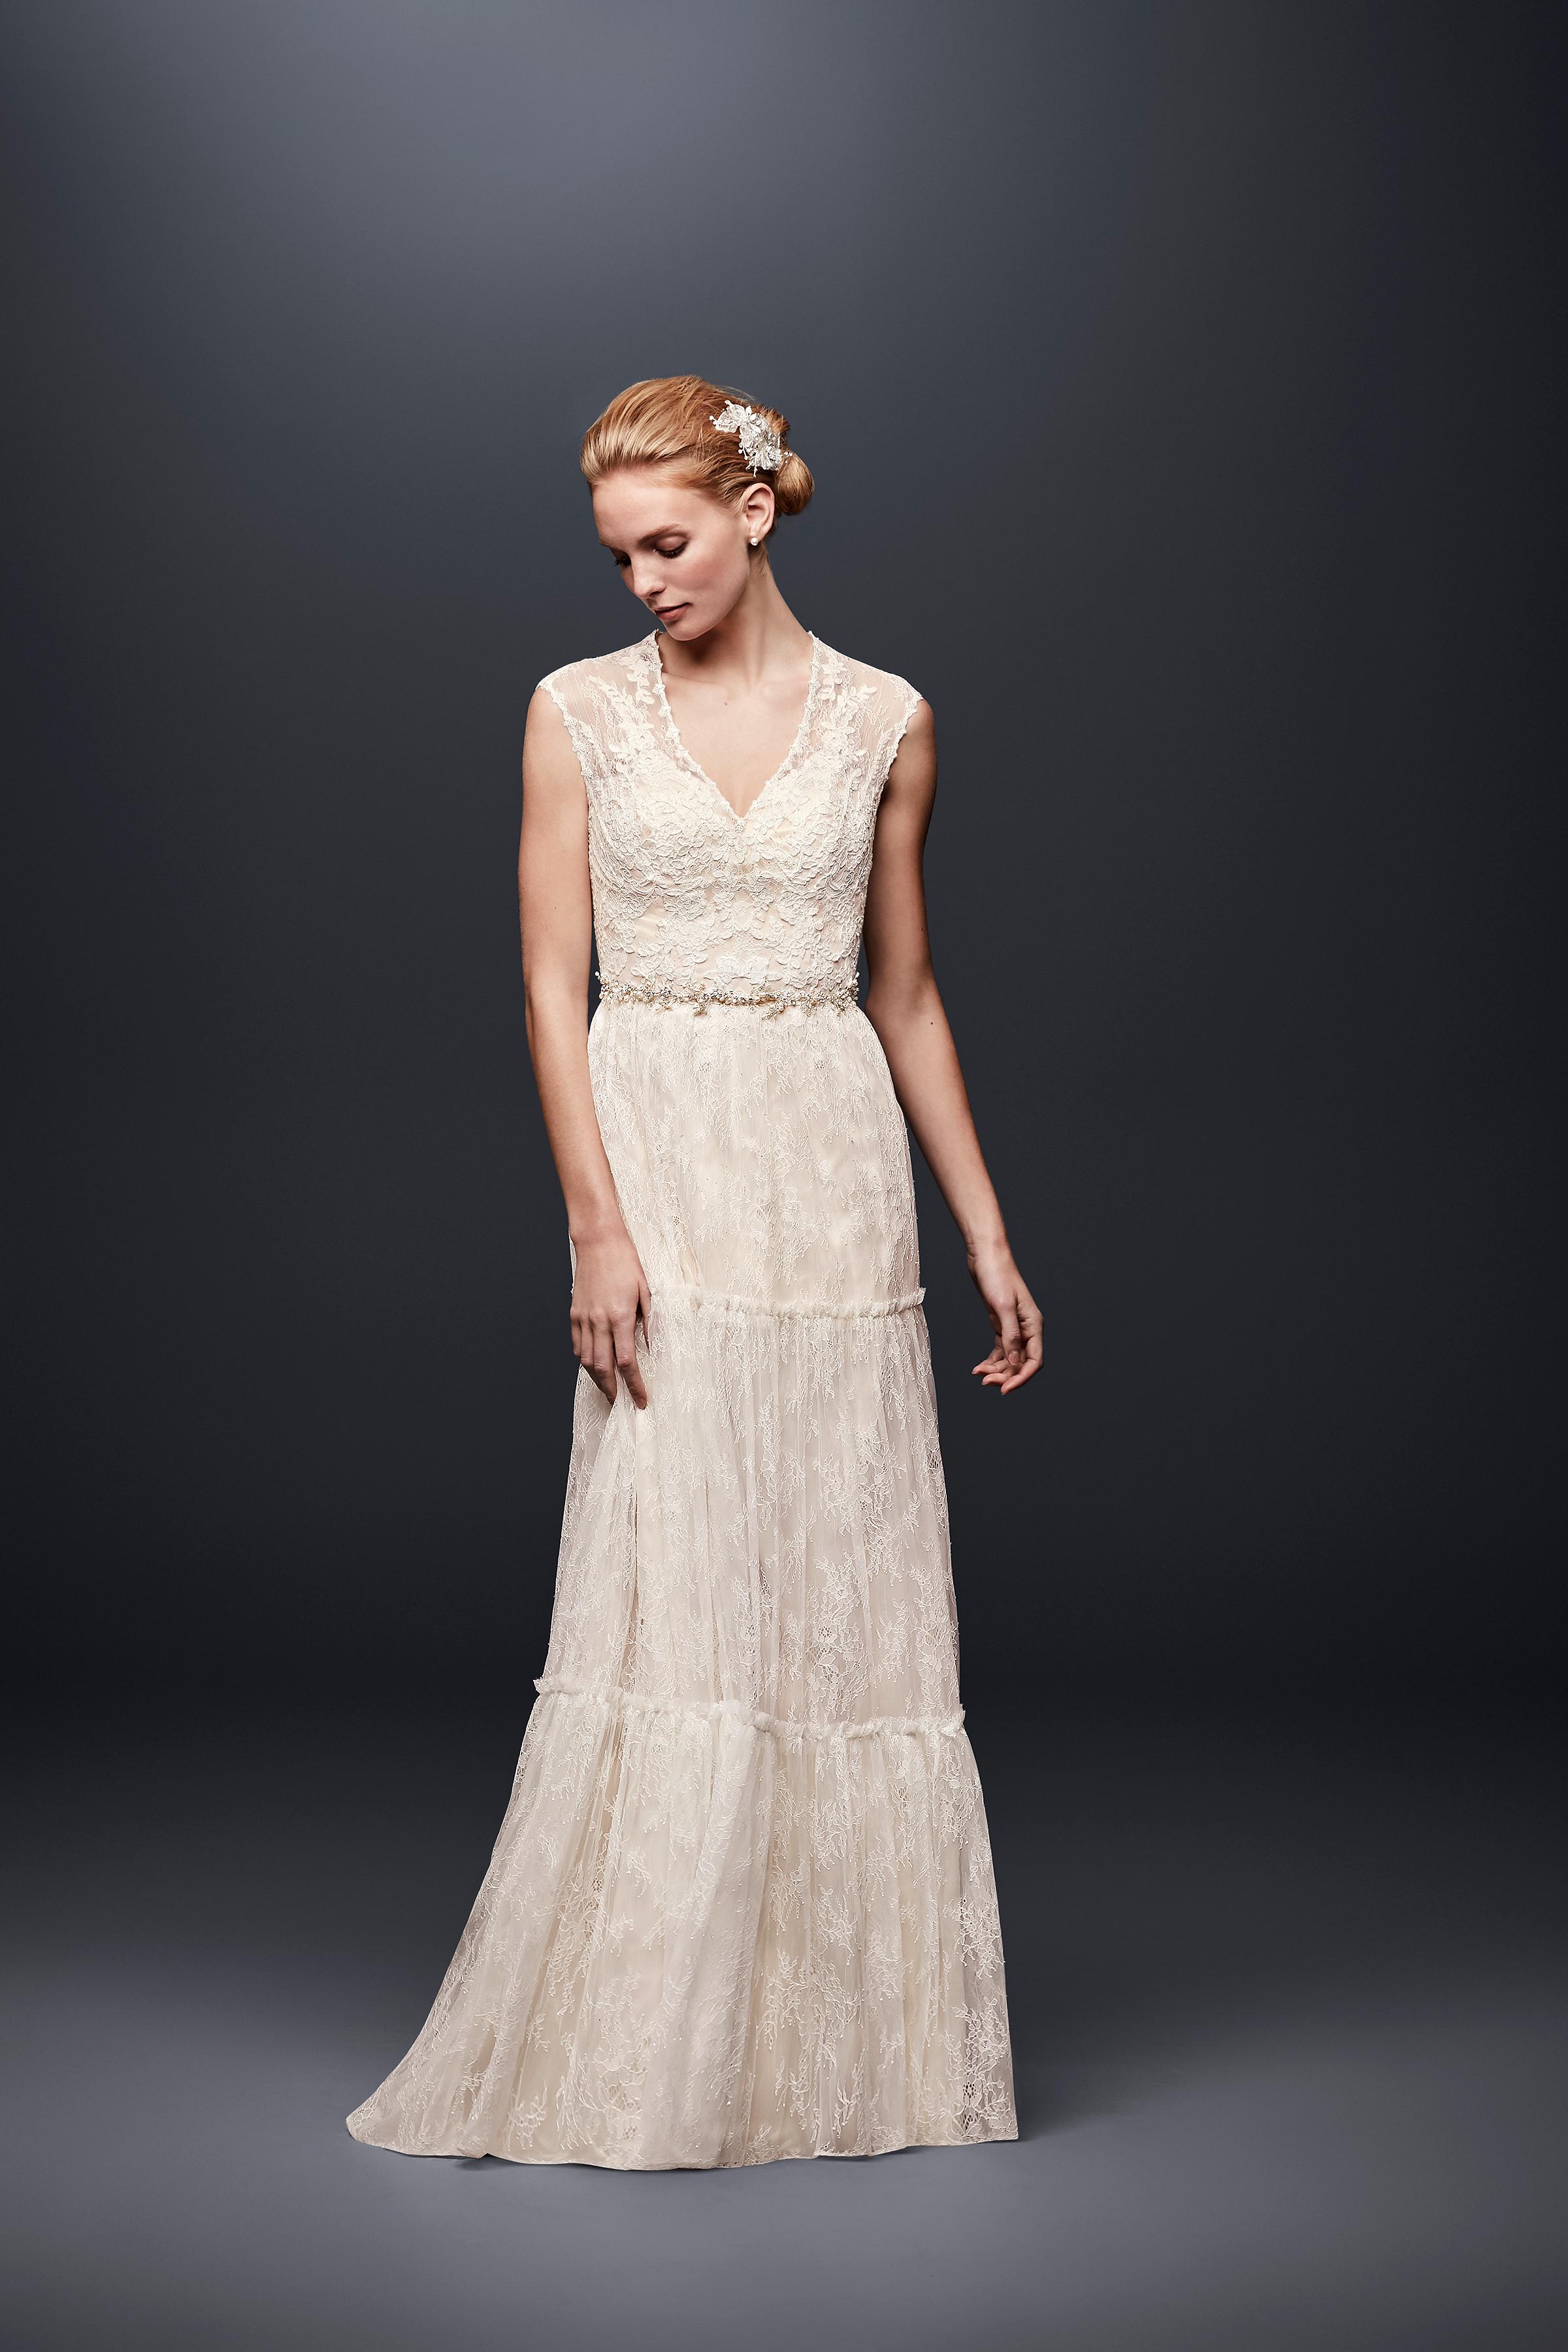 david bridal wedding dress spring 2019 v-neck lace sleeveless